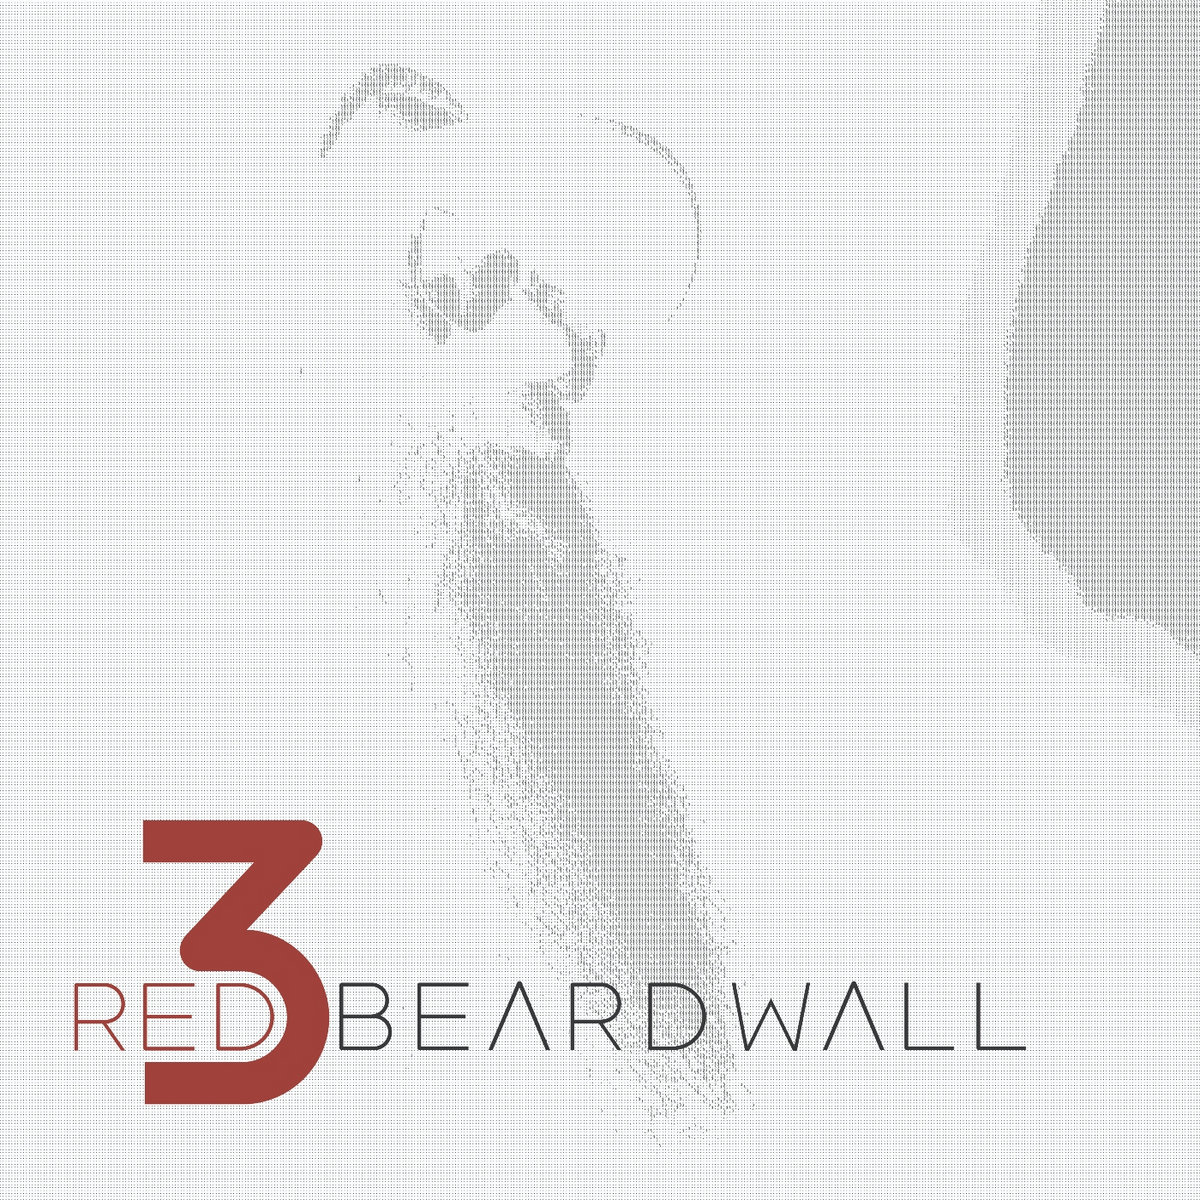 Red Beard Wall 3